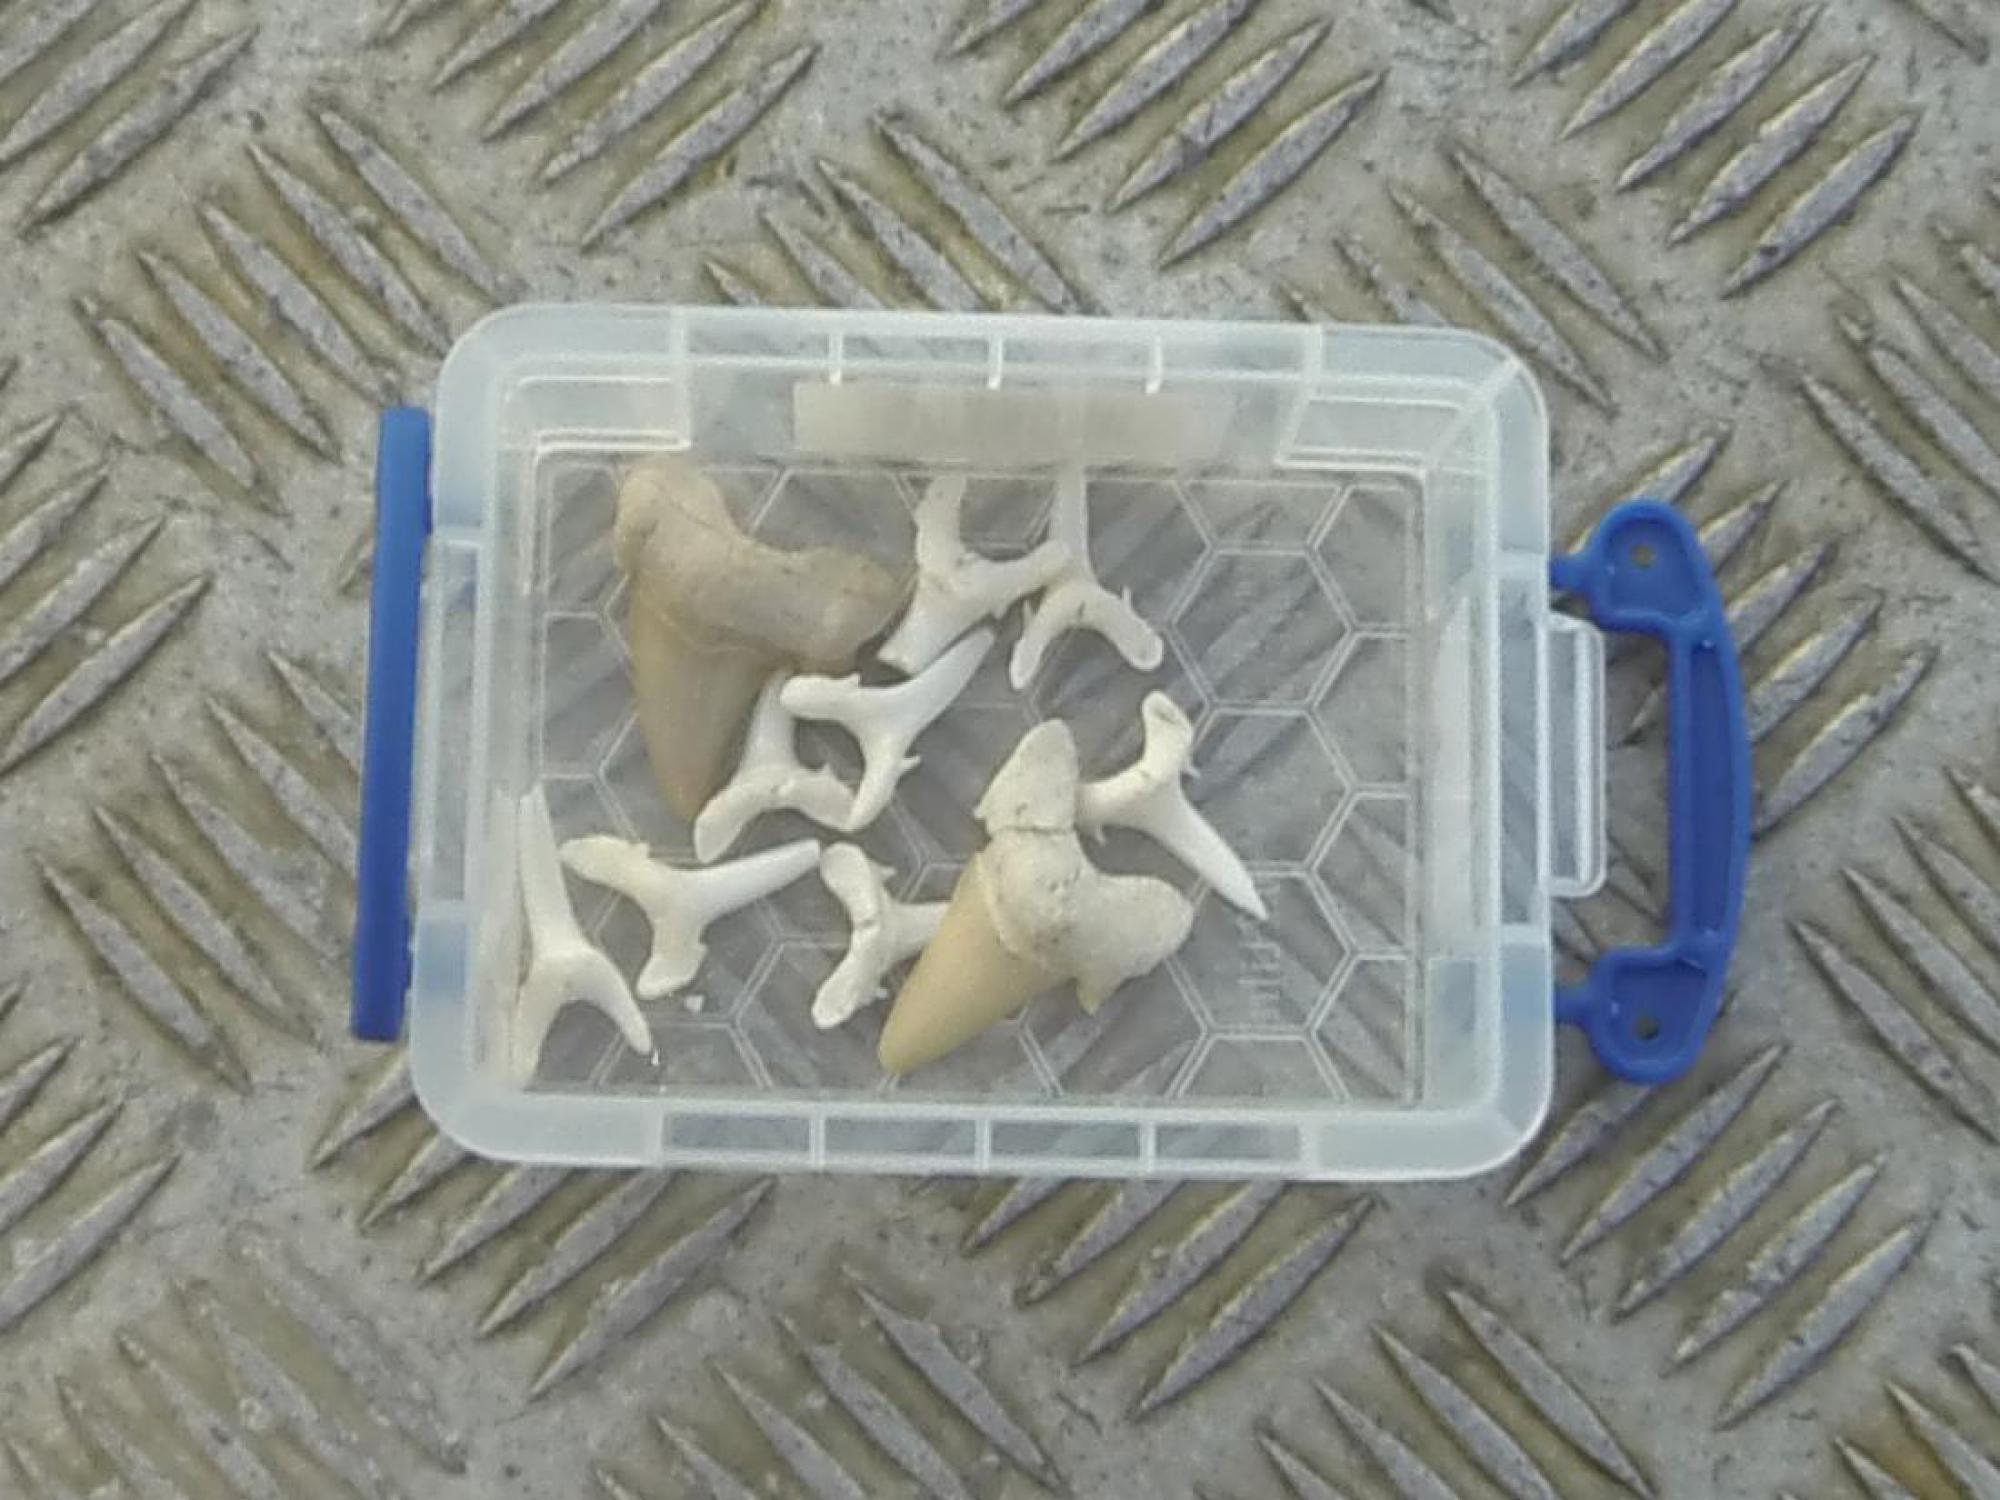 Sand tiger shark teeth and fossils of megalodon shark teeth